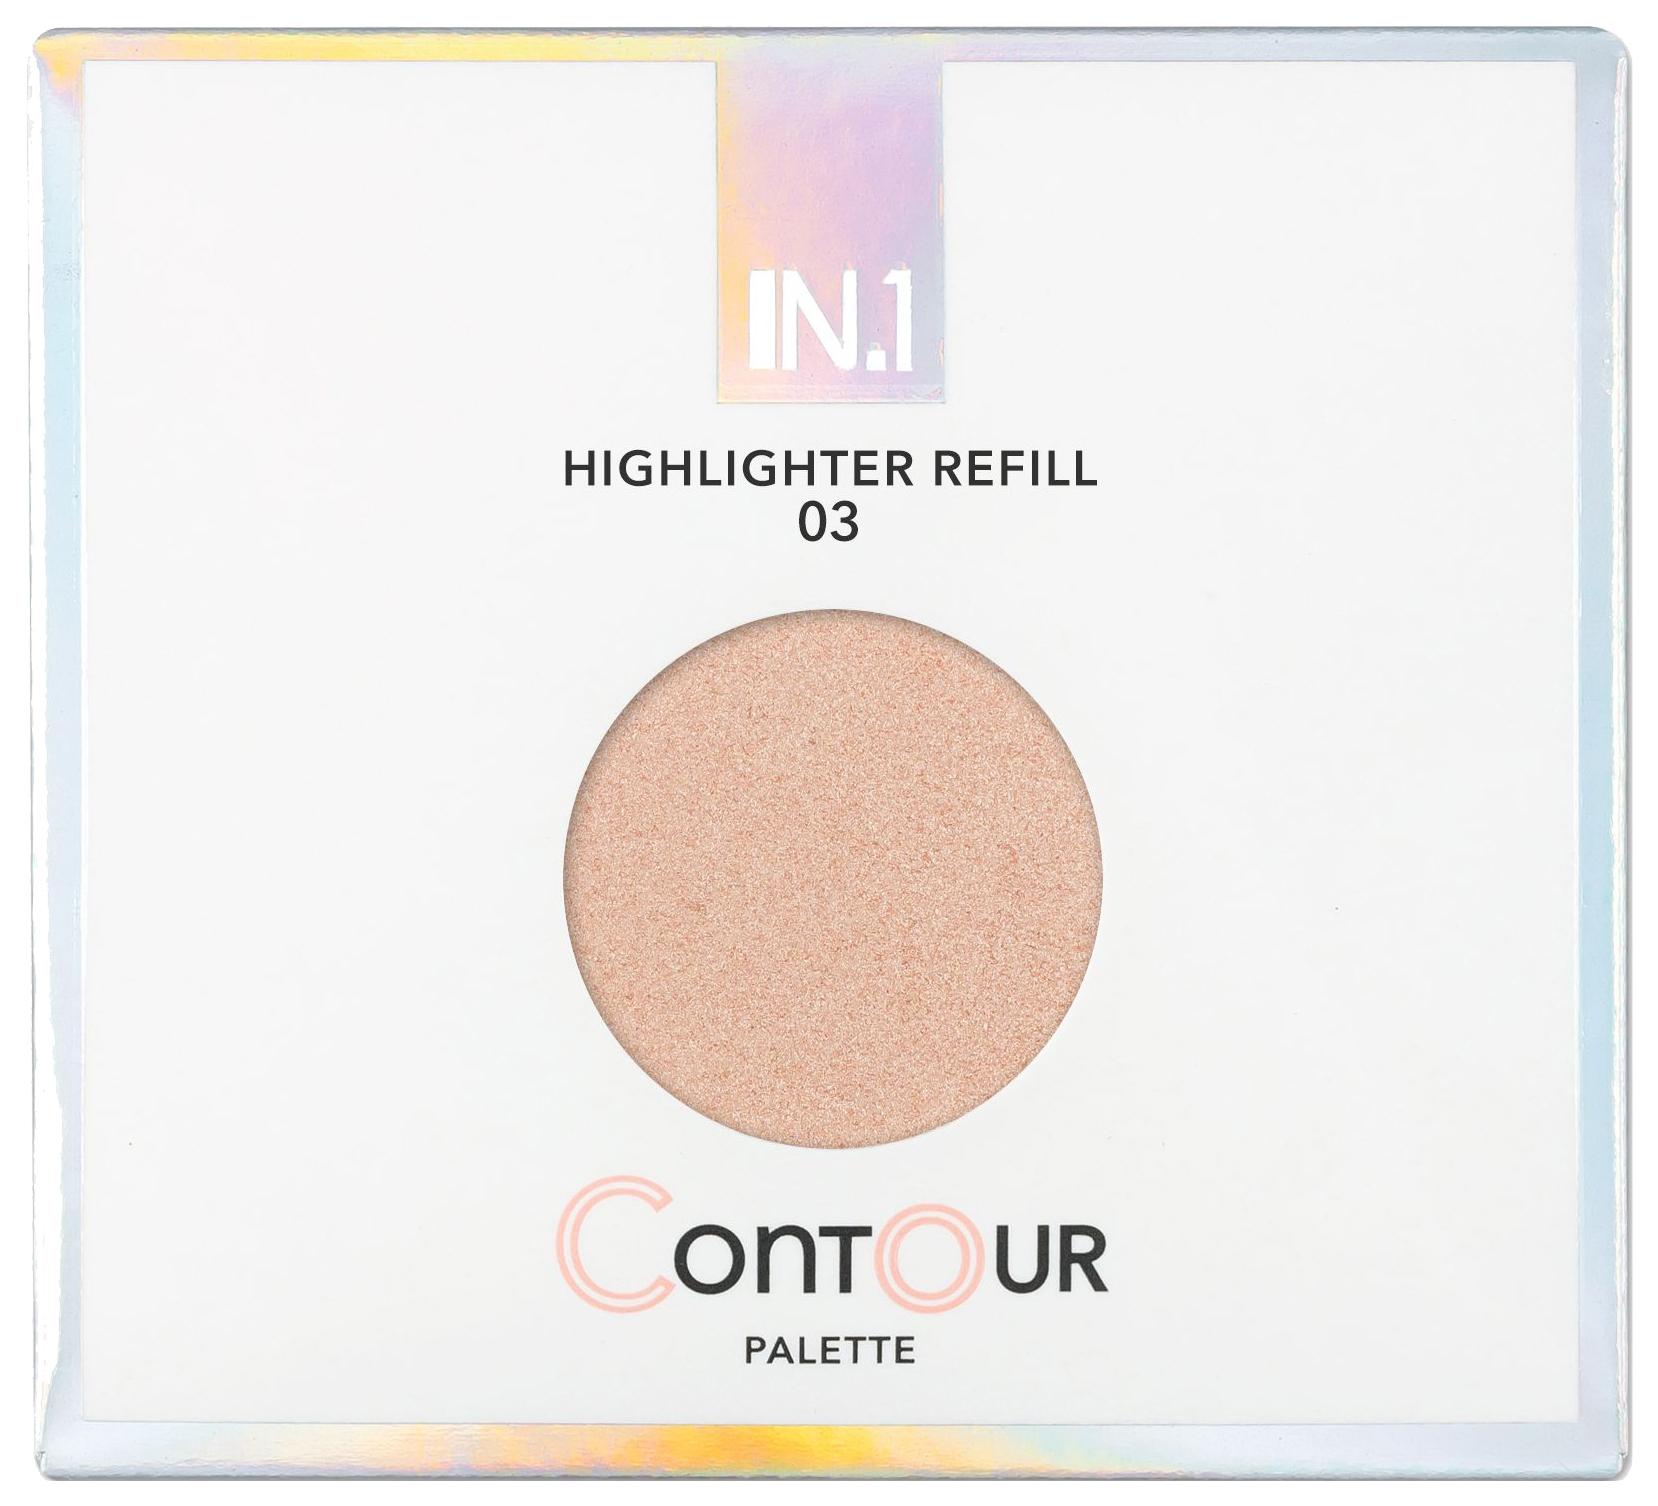 Сменный блок хайлайтера N.1 Contour Palette Highlighter